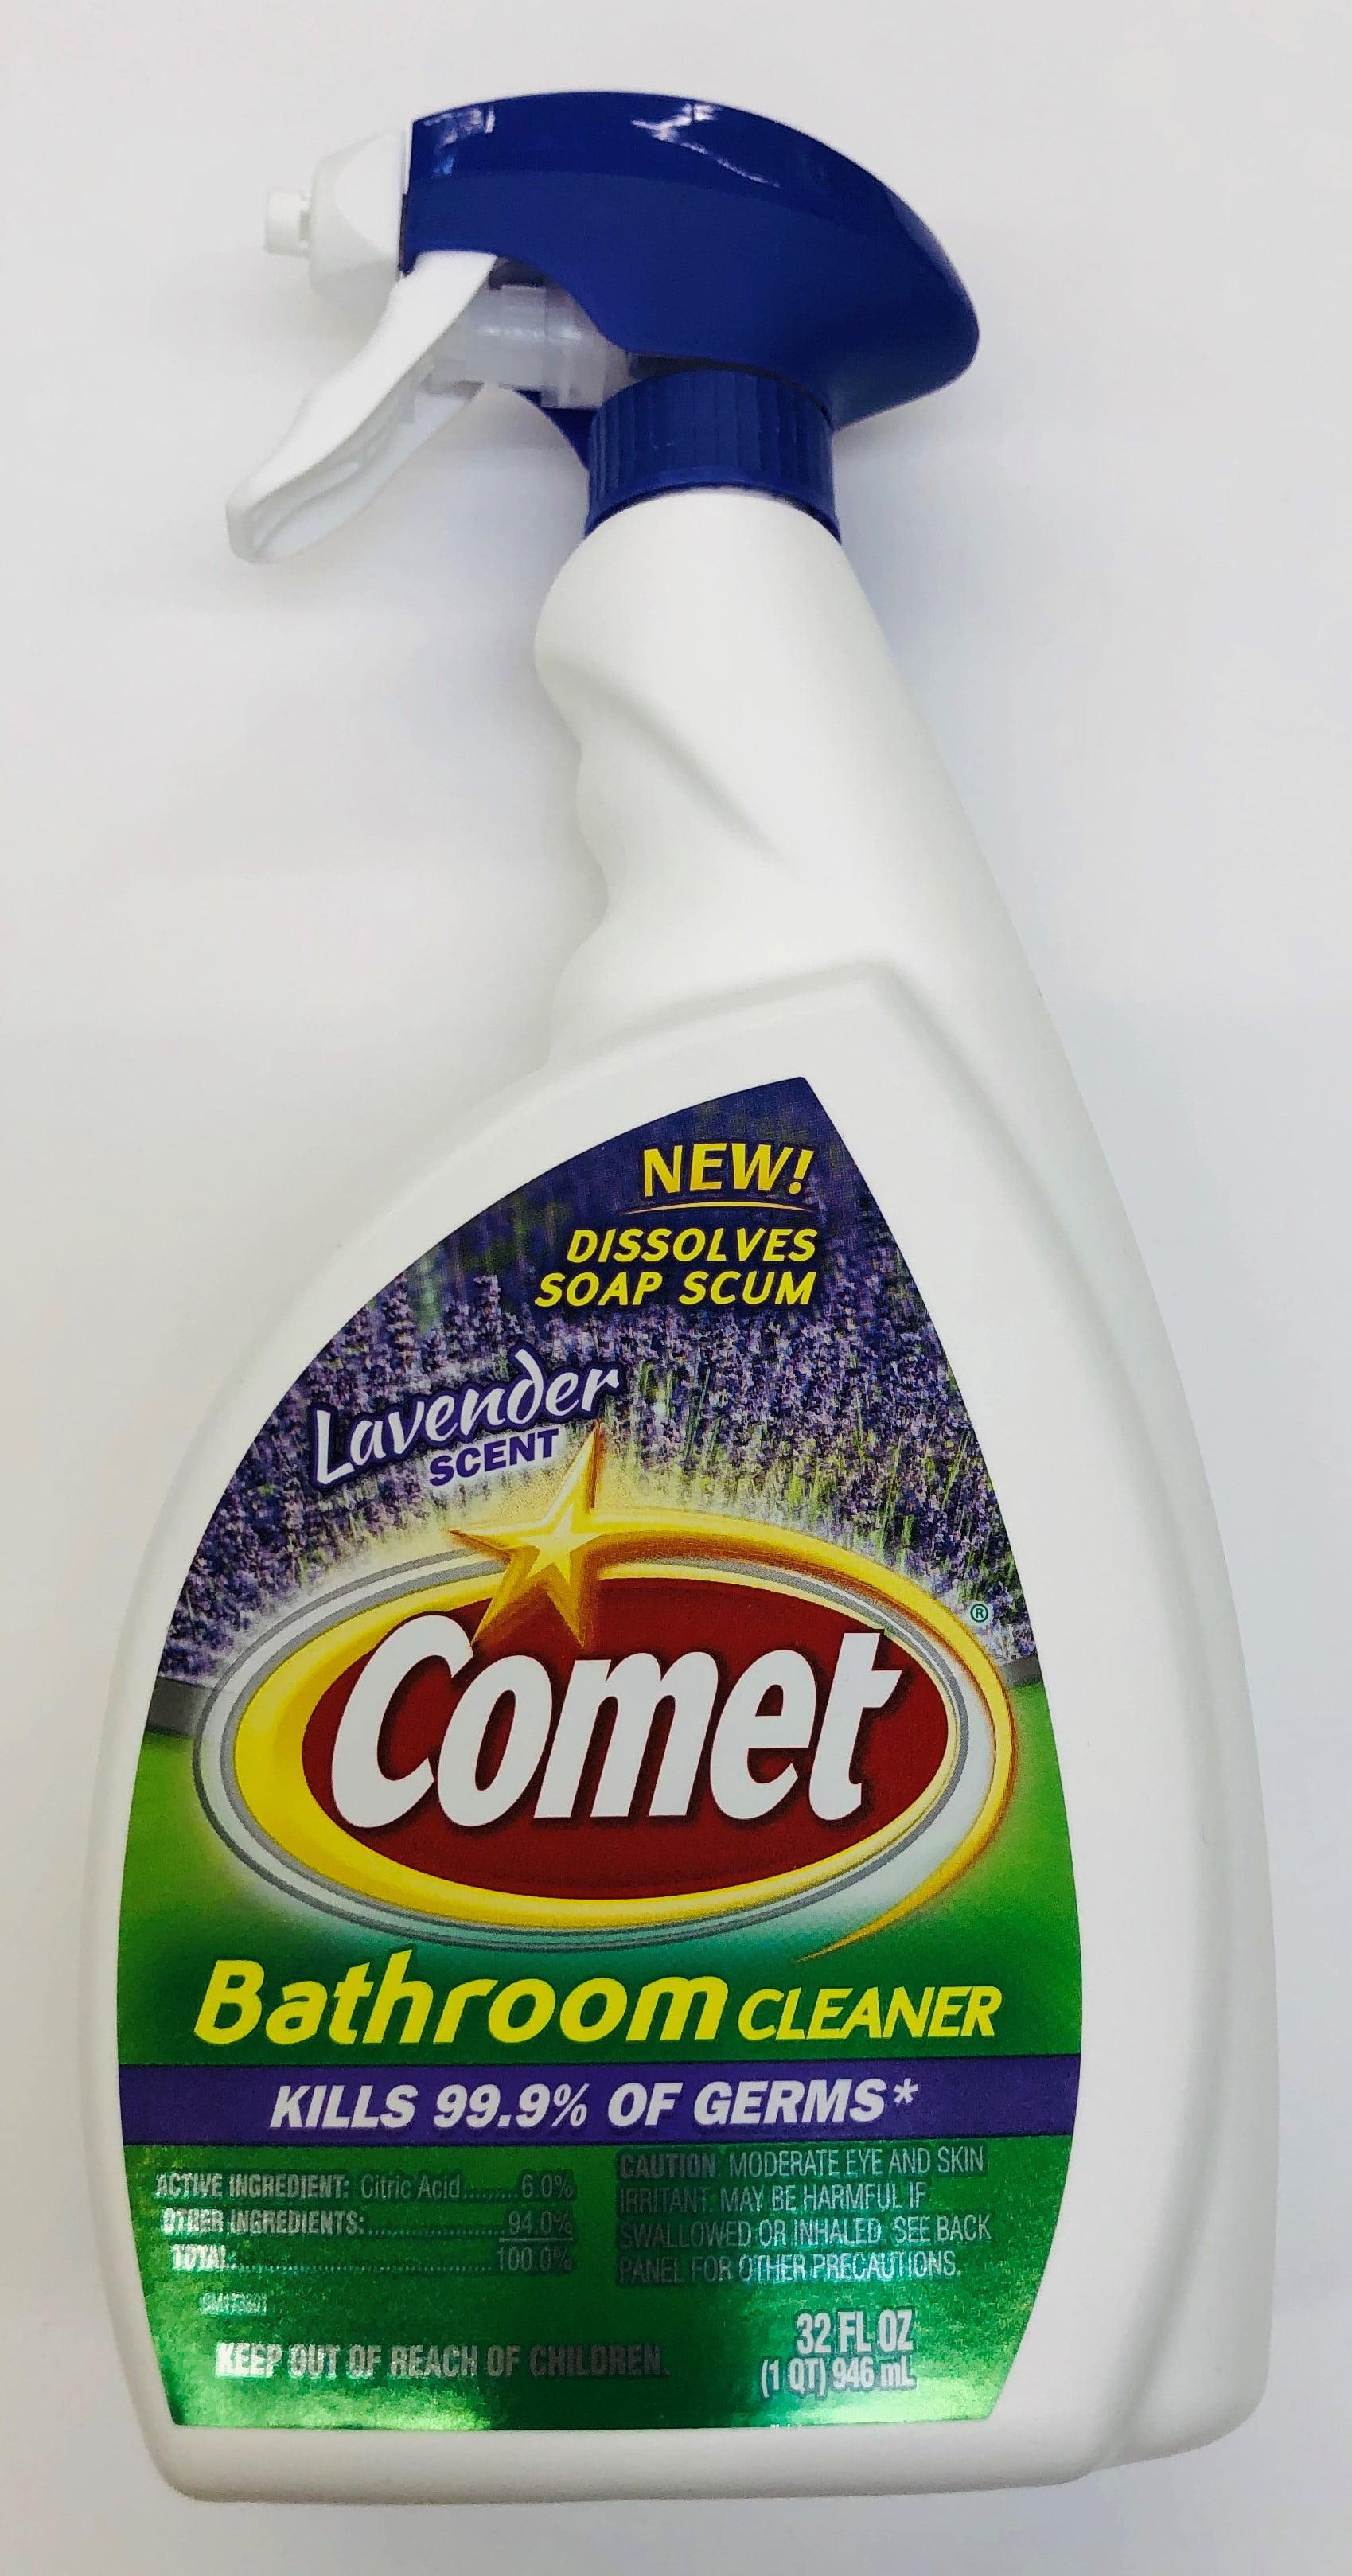 Comet Lavender Bathroom Cleaner 32oz Walmart Com Walmart Com